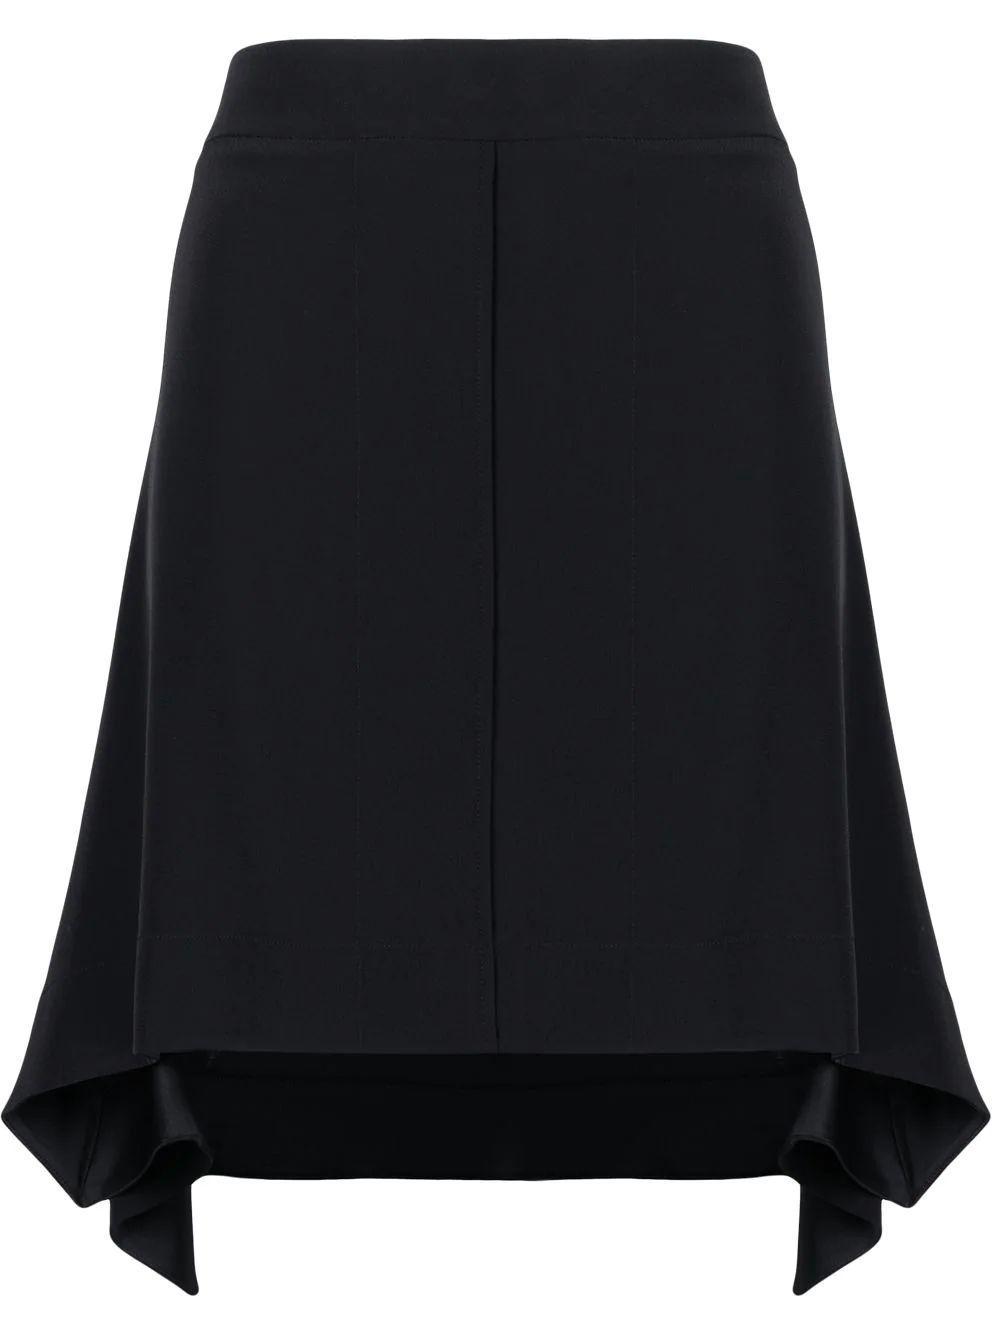 Asymmetric Skirt Item # 2121WSK002348A